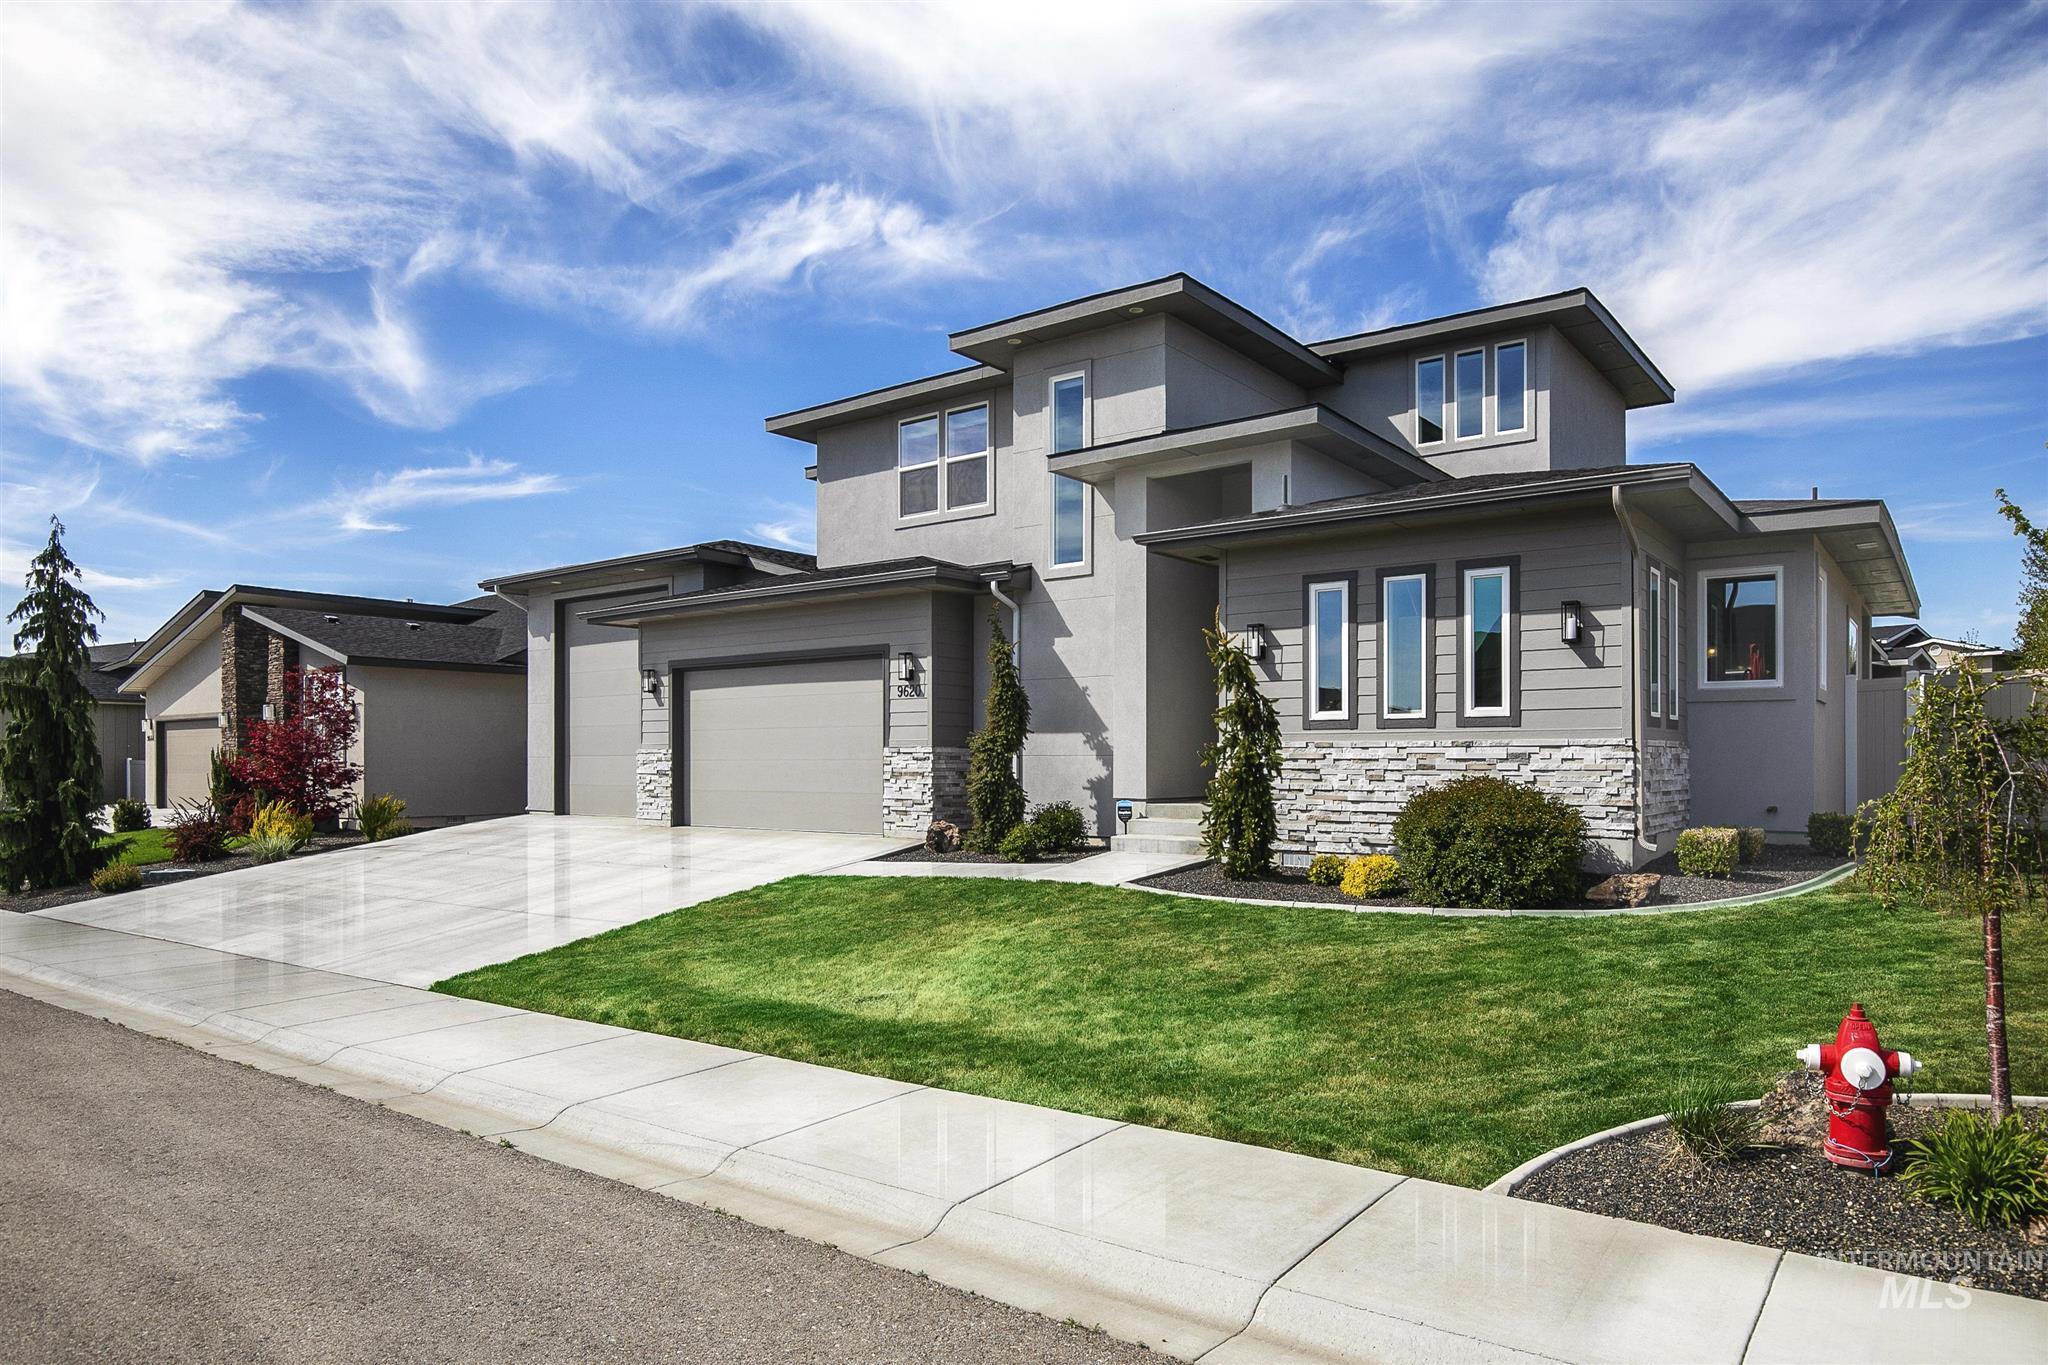 9620 W Snowcap Dr Property Photo - Boise, ID real estate listing